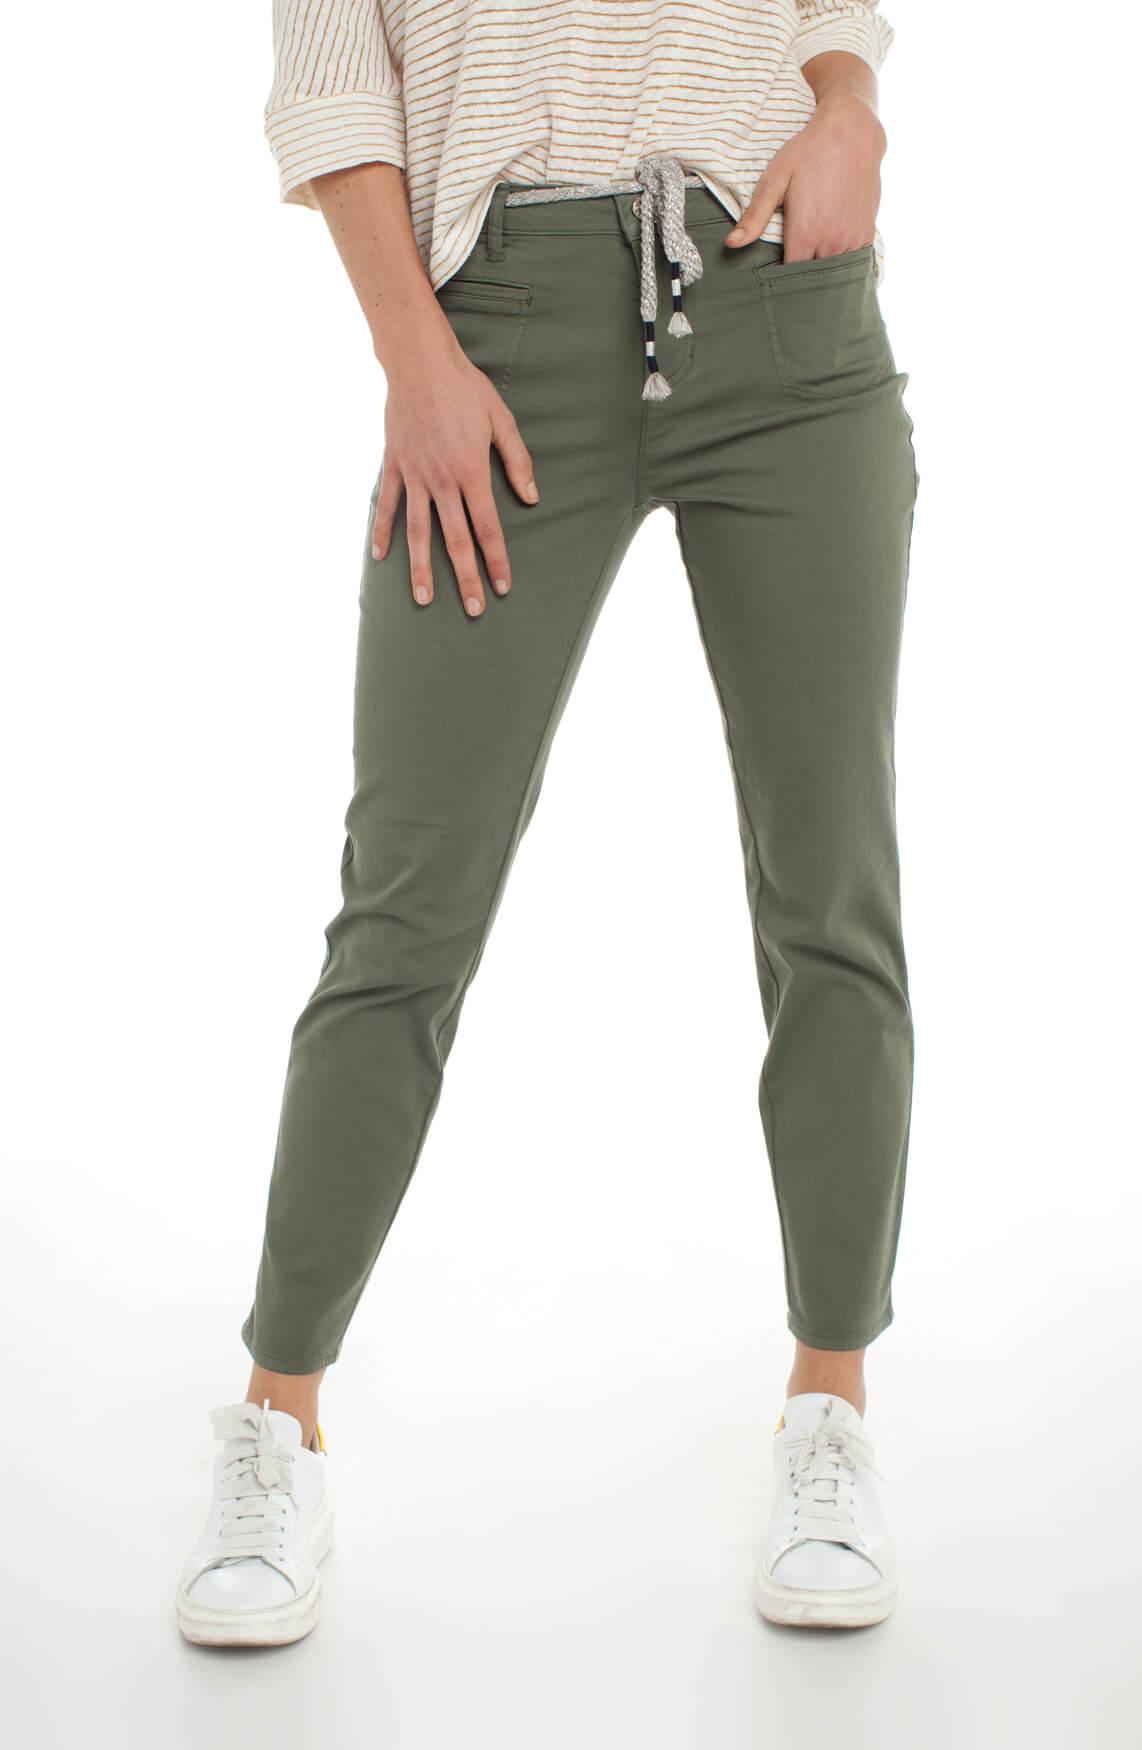 Rosner Dames Alisa broek met glitter ceintuur groen